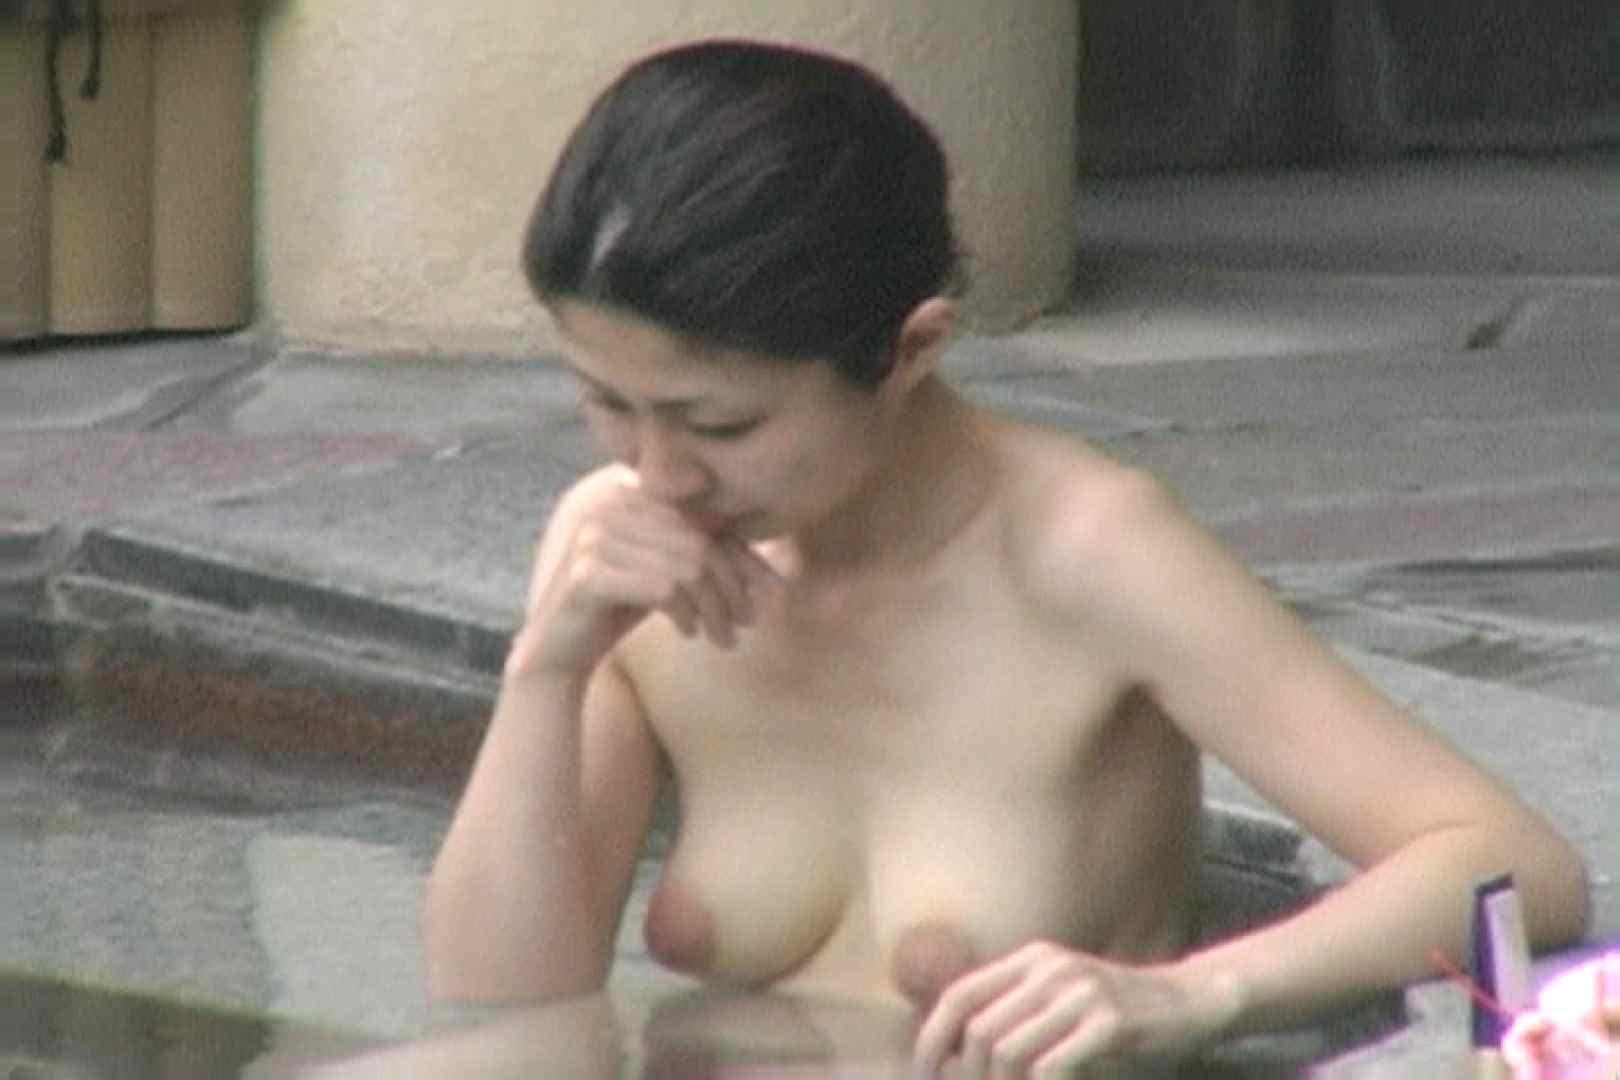 Aquaな露天風呂Vol.642 美しいOLの裸体 | 露天風呂突入  86pic 85